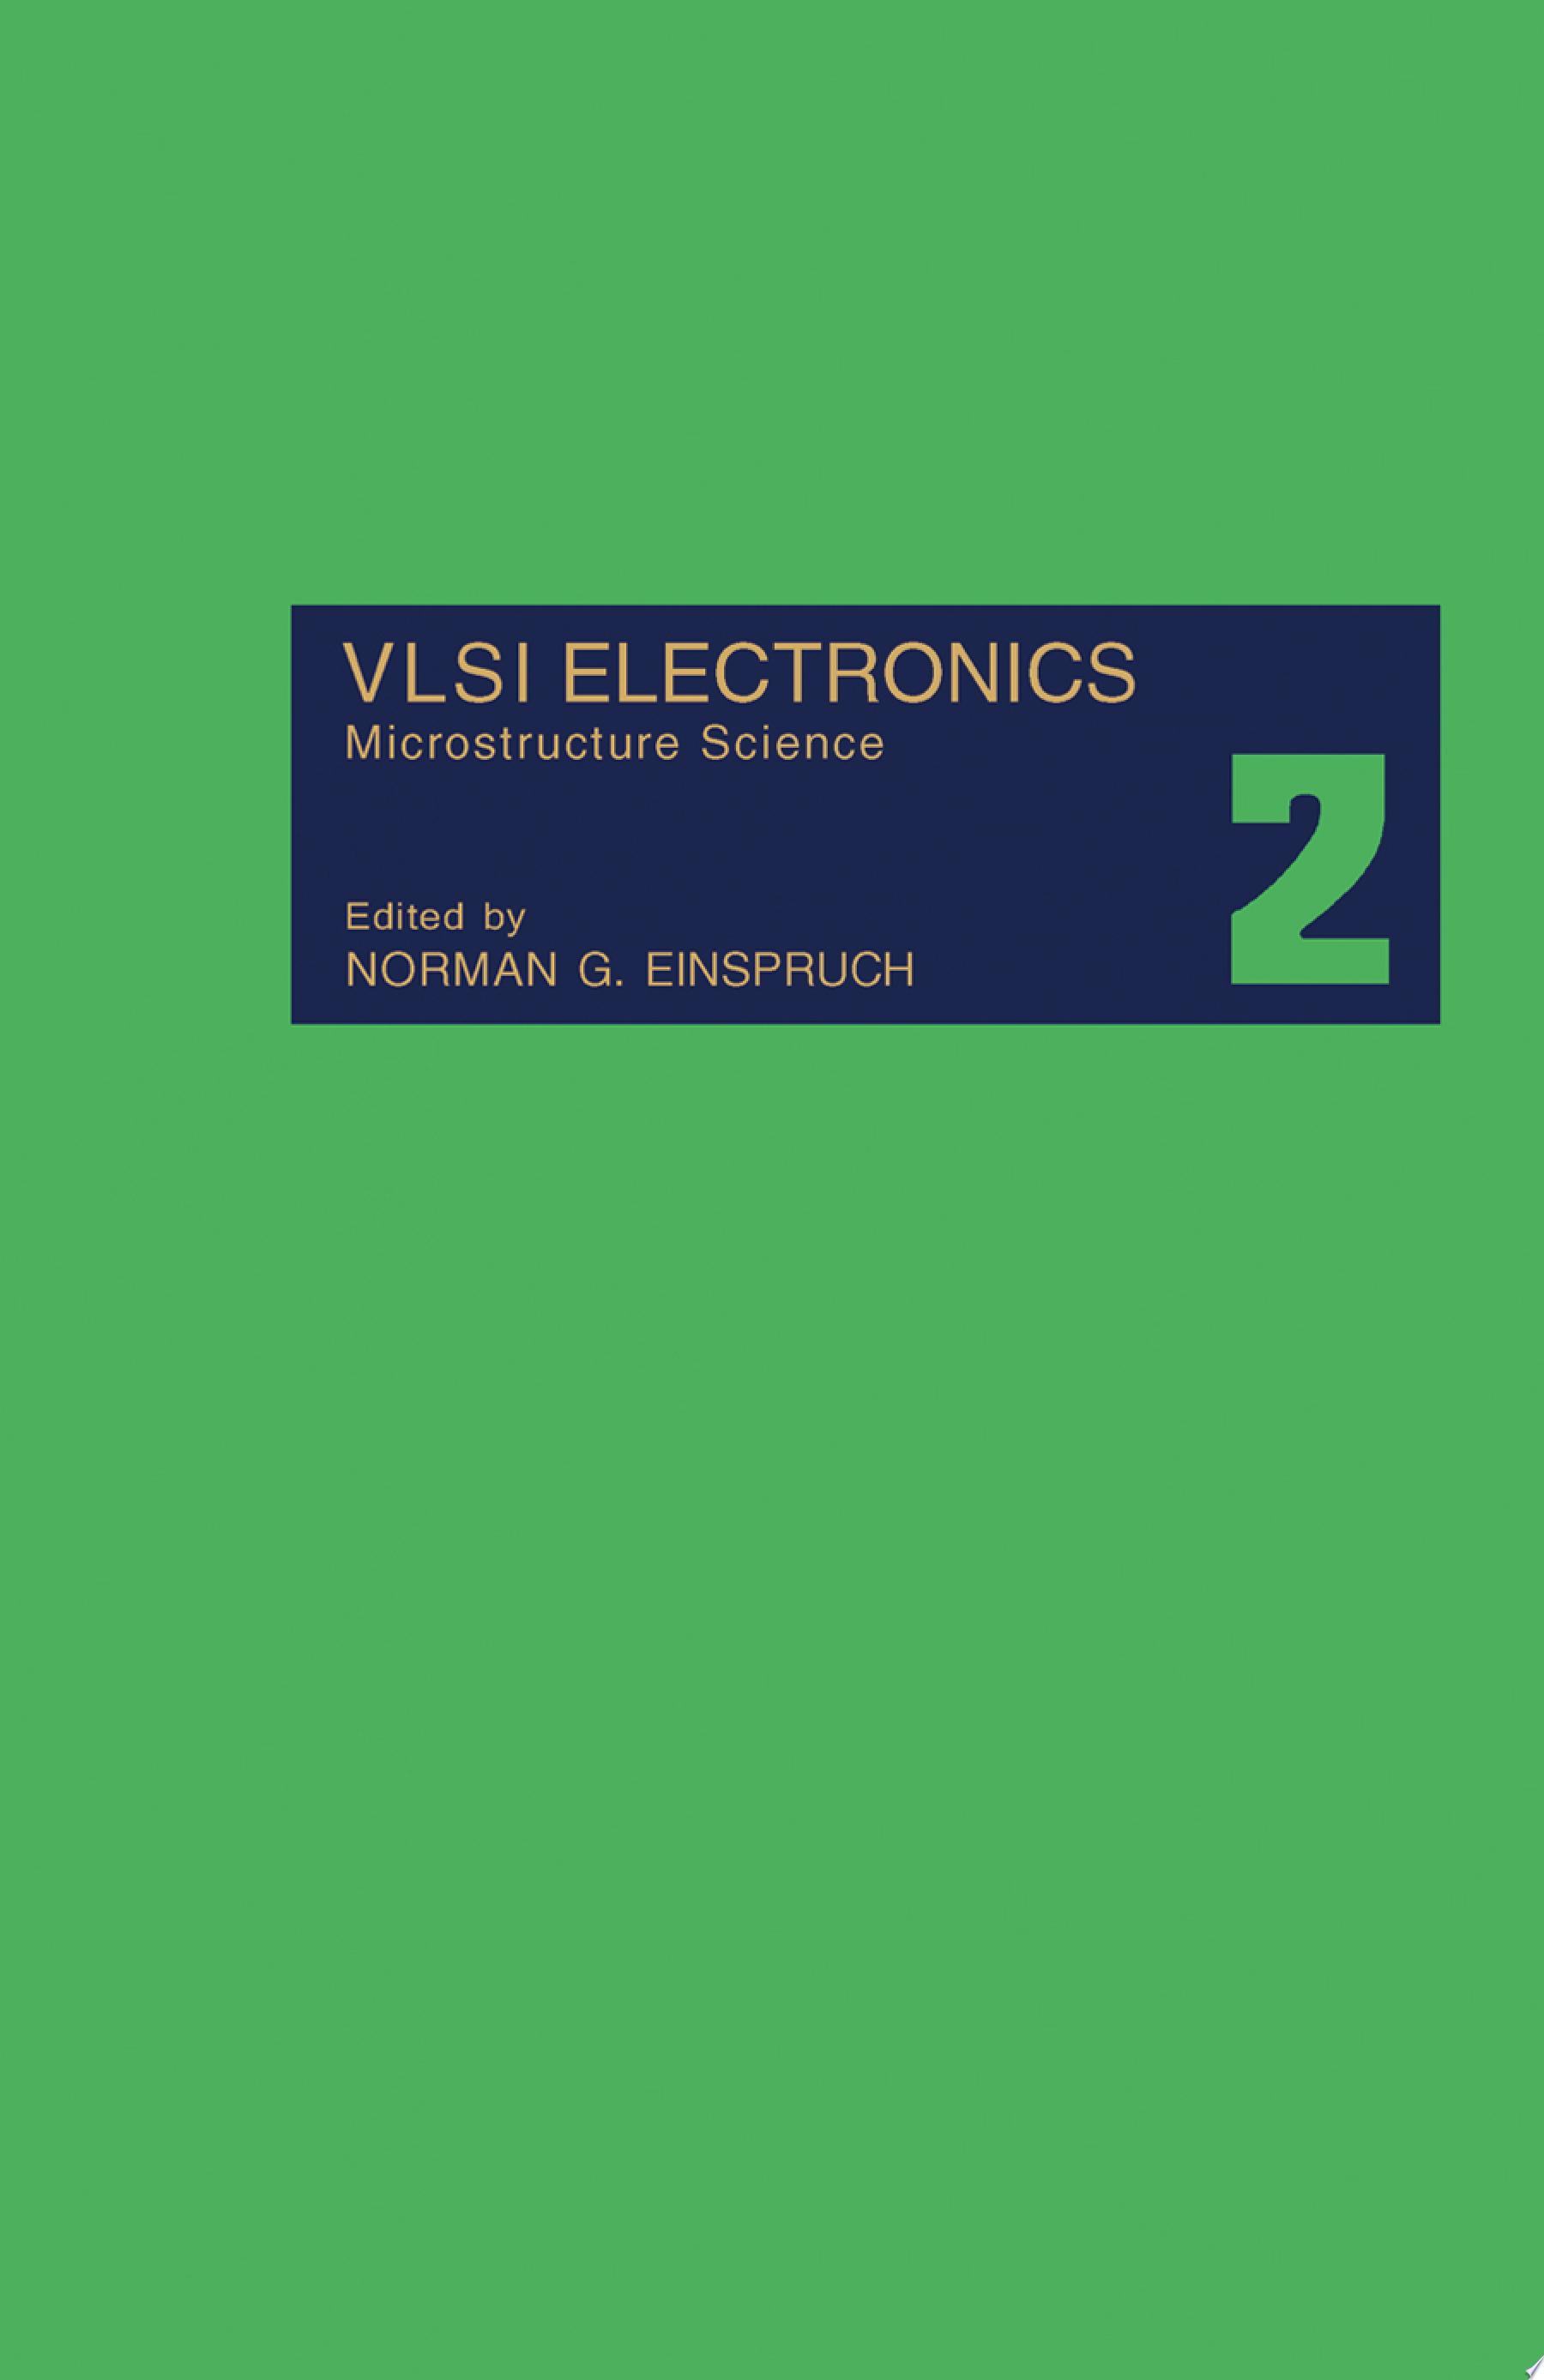 VLSI Electronics